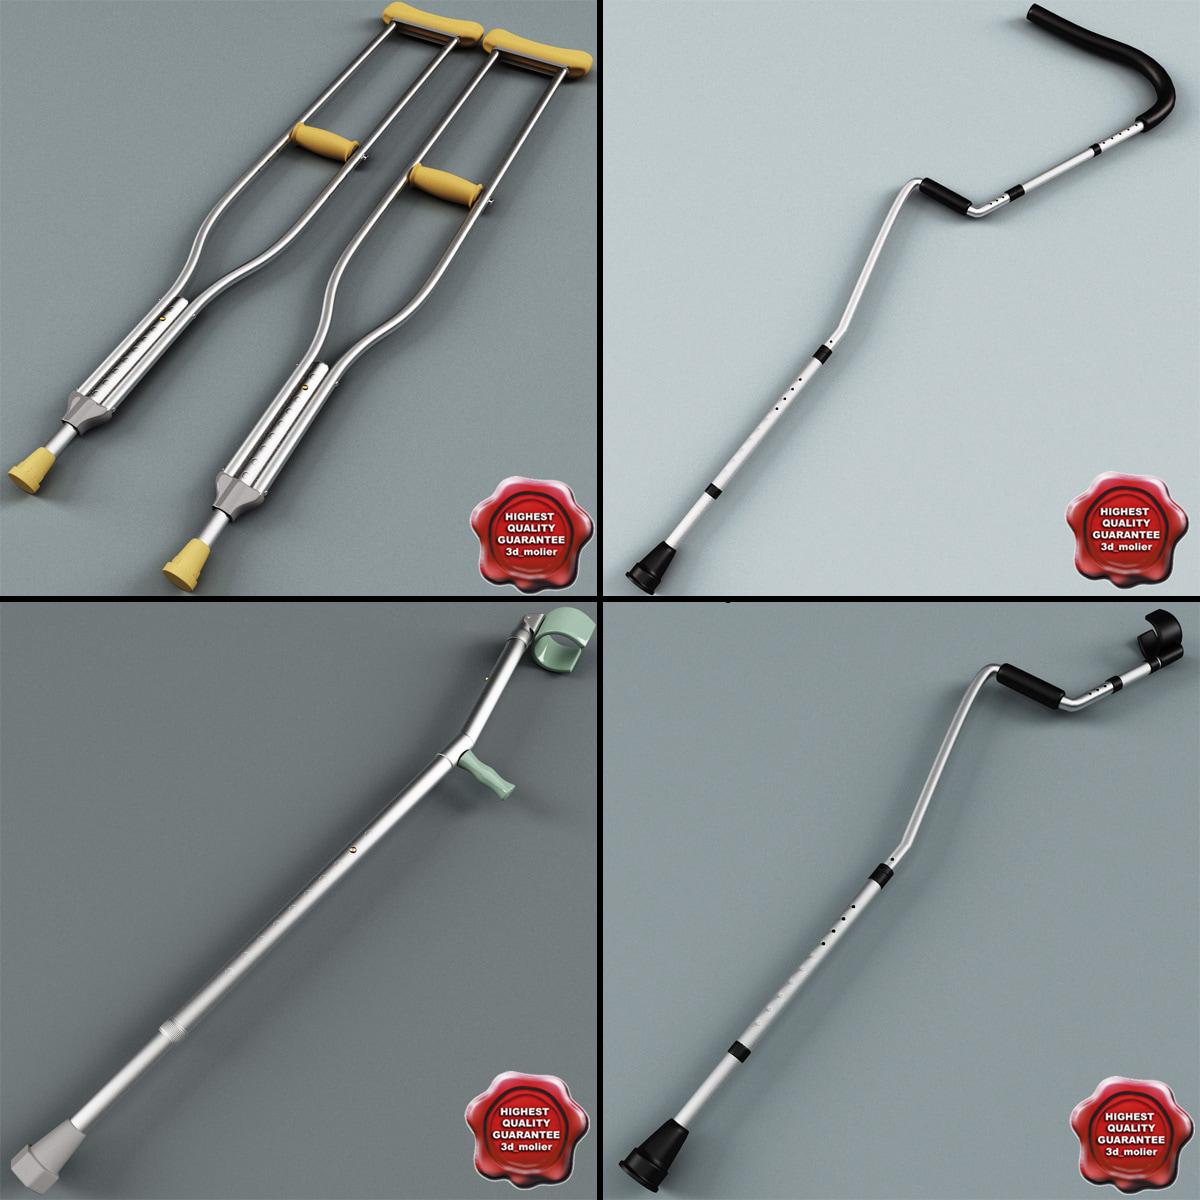 Crutches_Collection_00.jpg